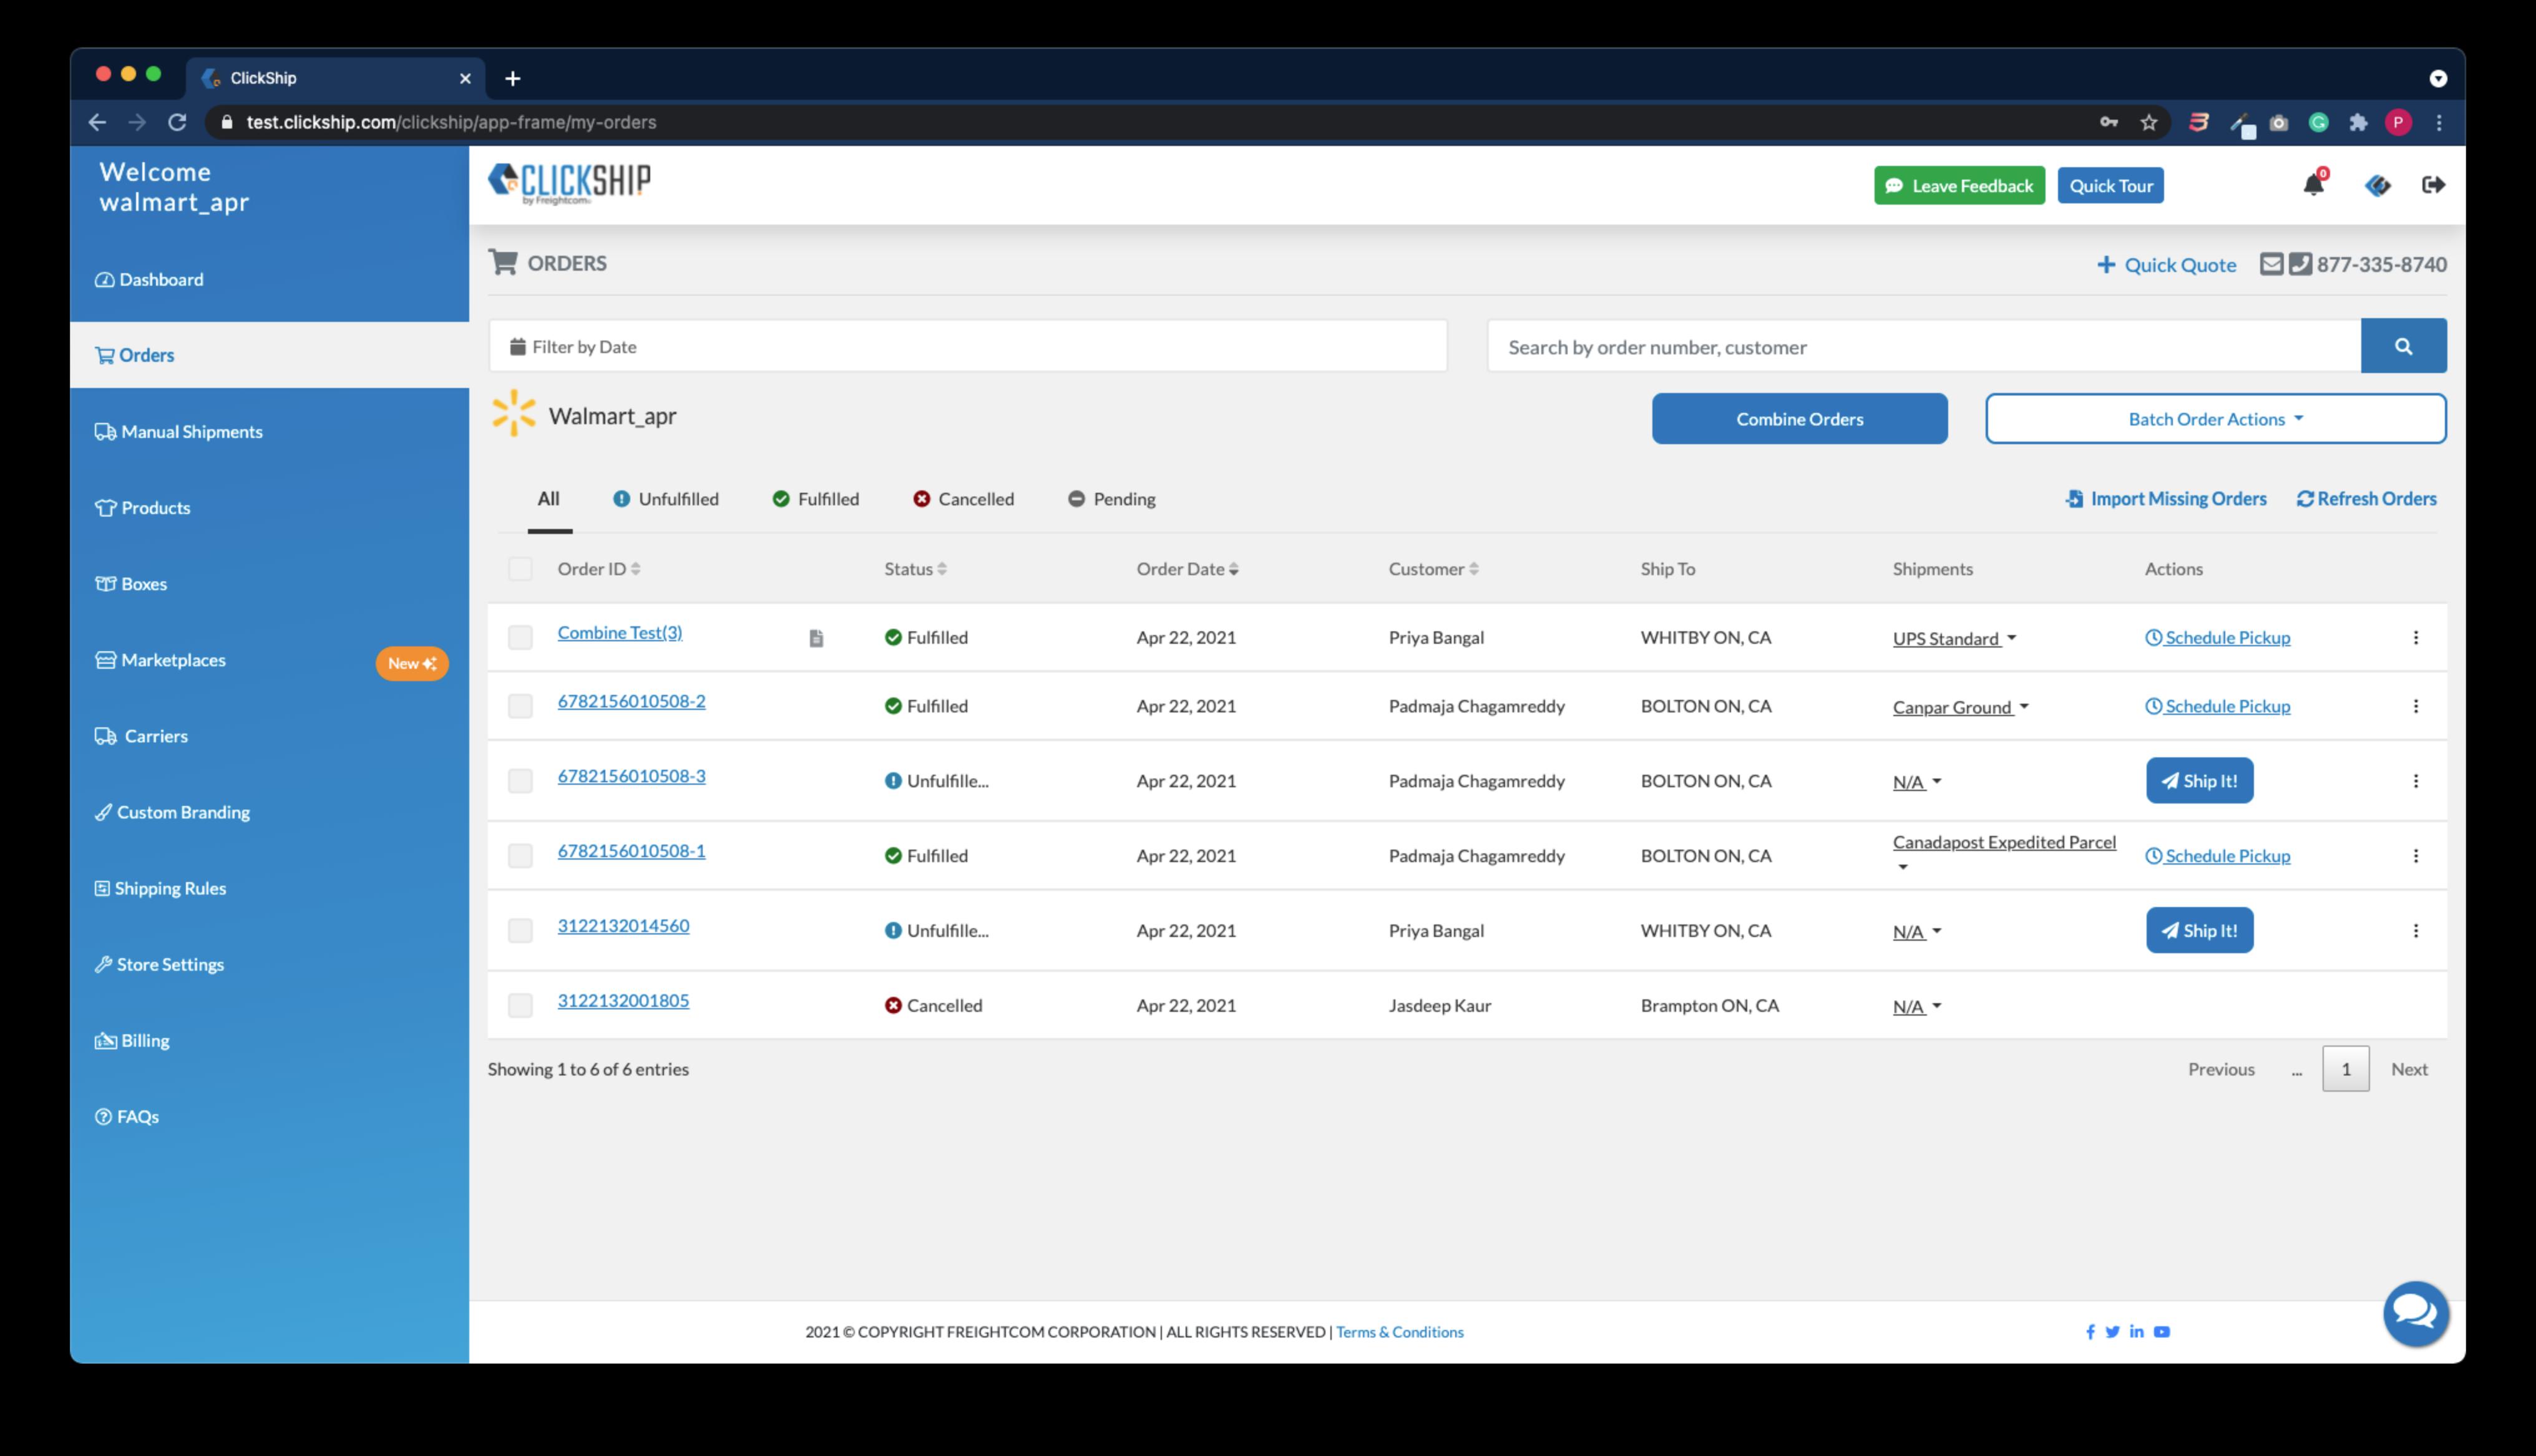 Order Integration Page - Clickship